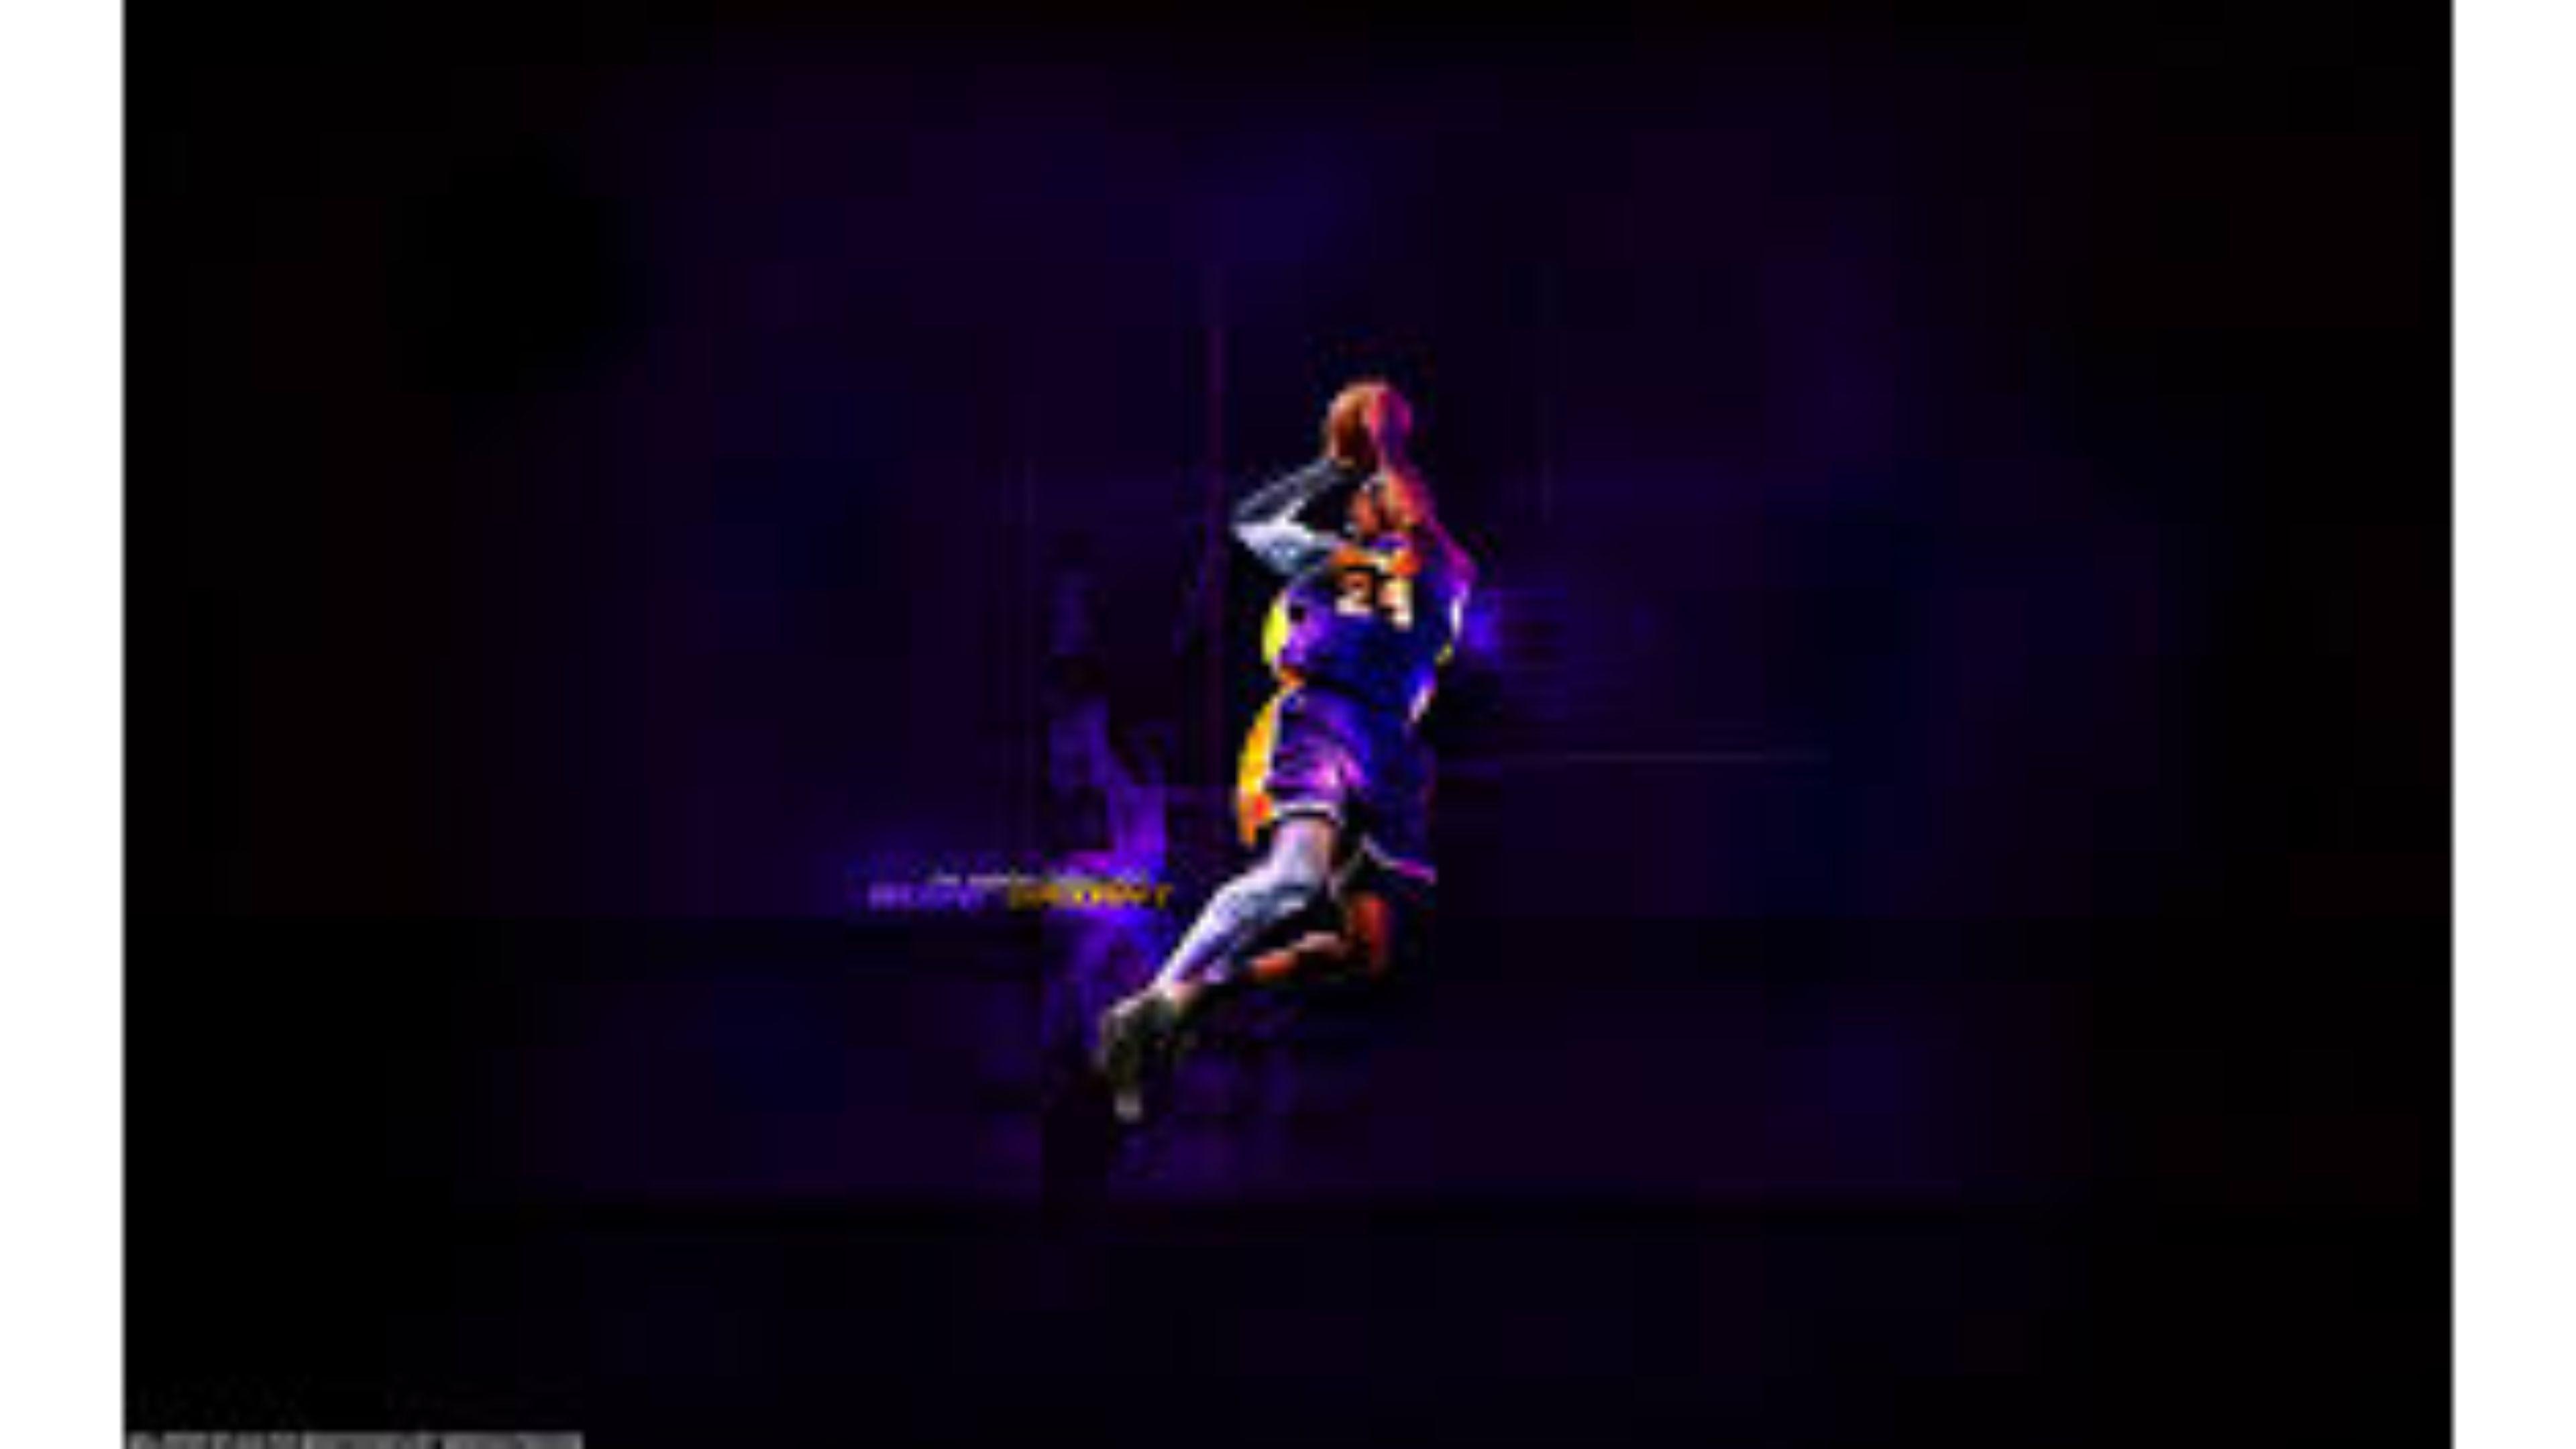 Kobe Bryant Wallpaper 2018 (73+ images)